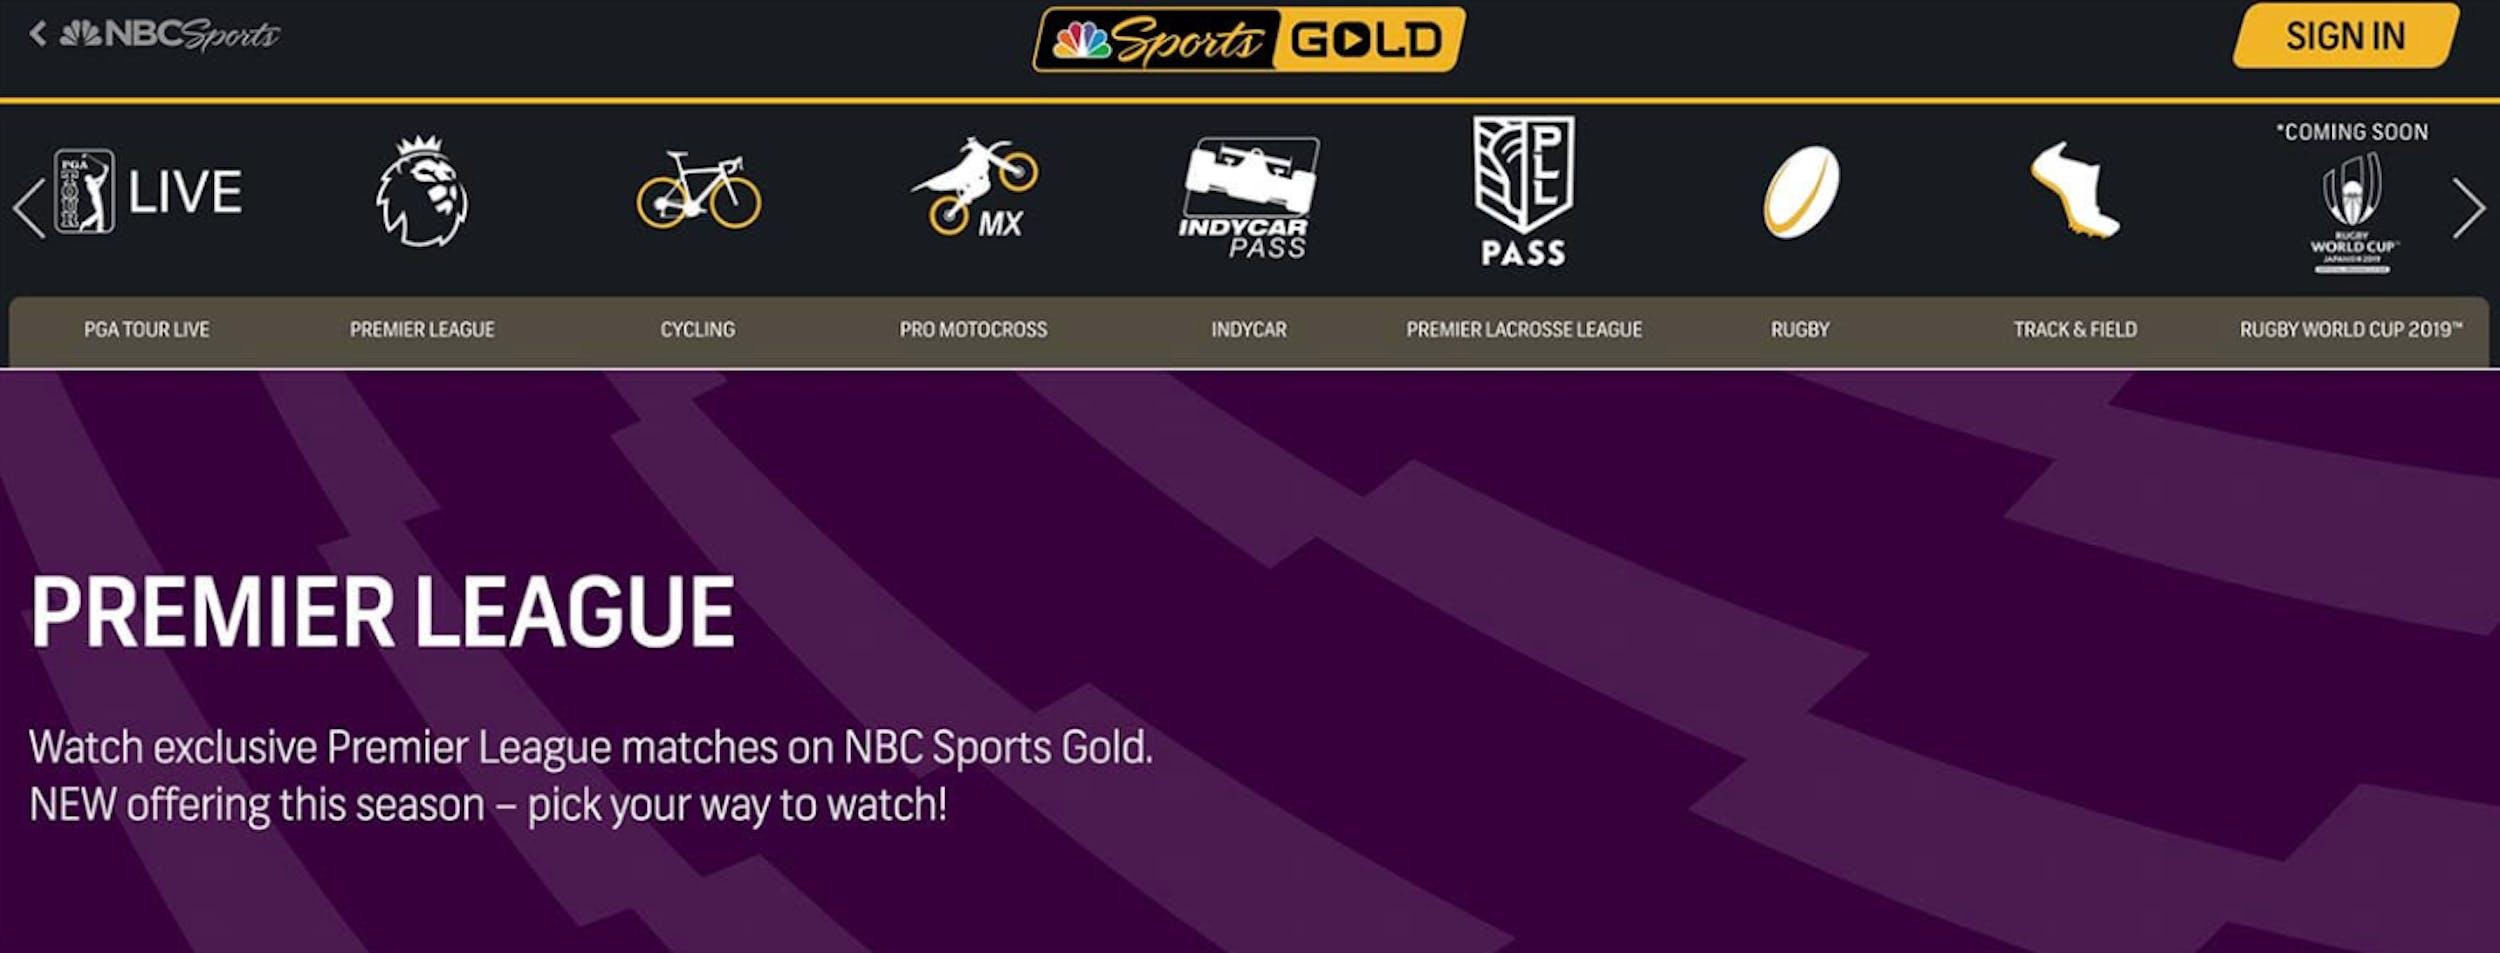 man united vs norwich city live stream NBC sports gold